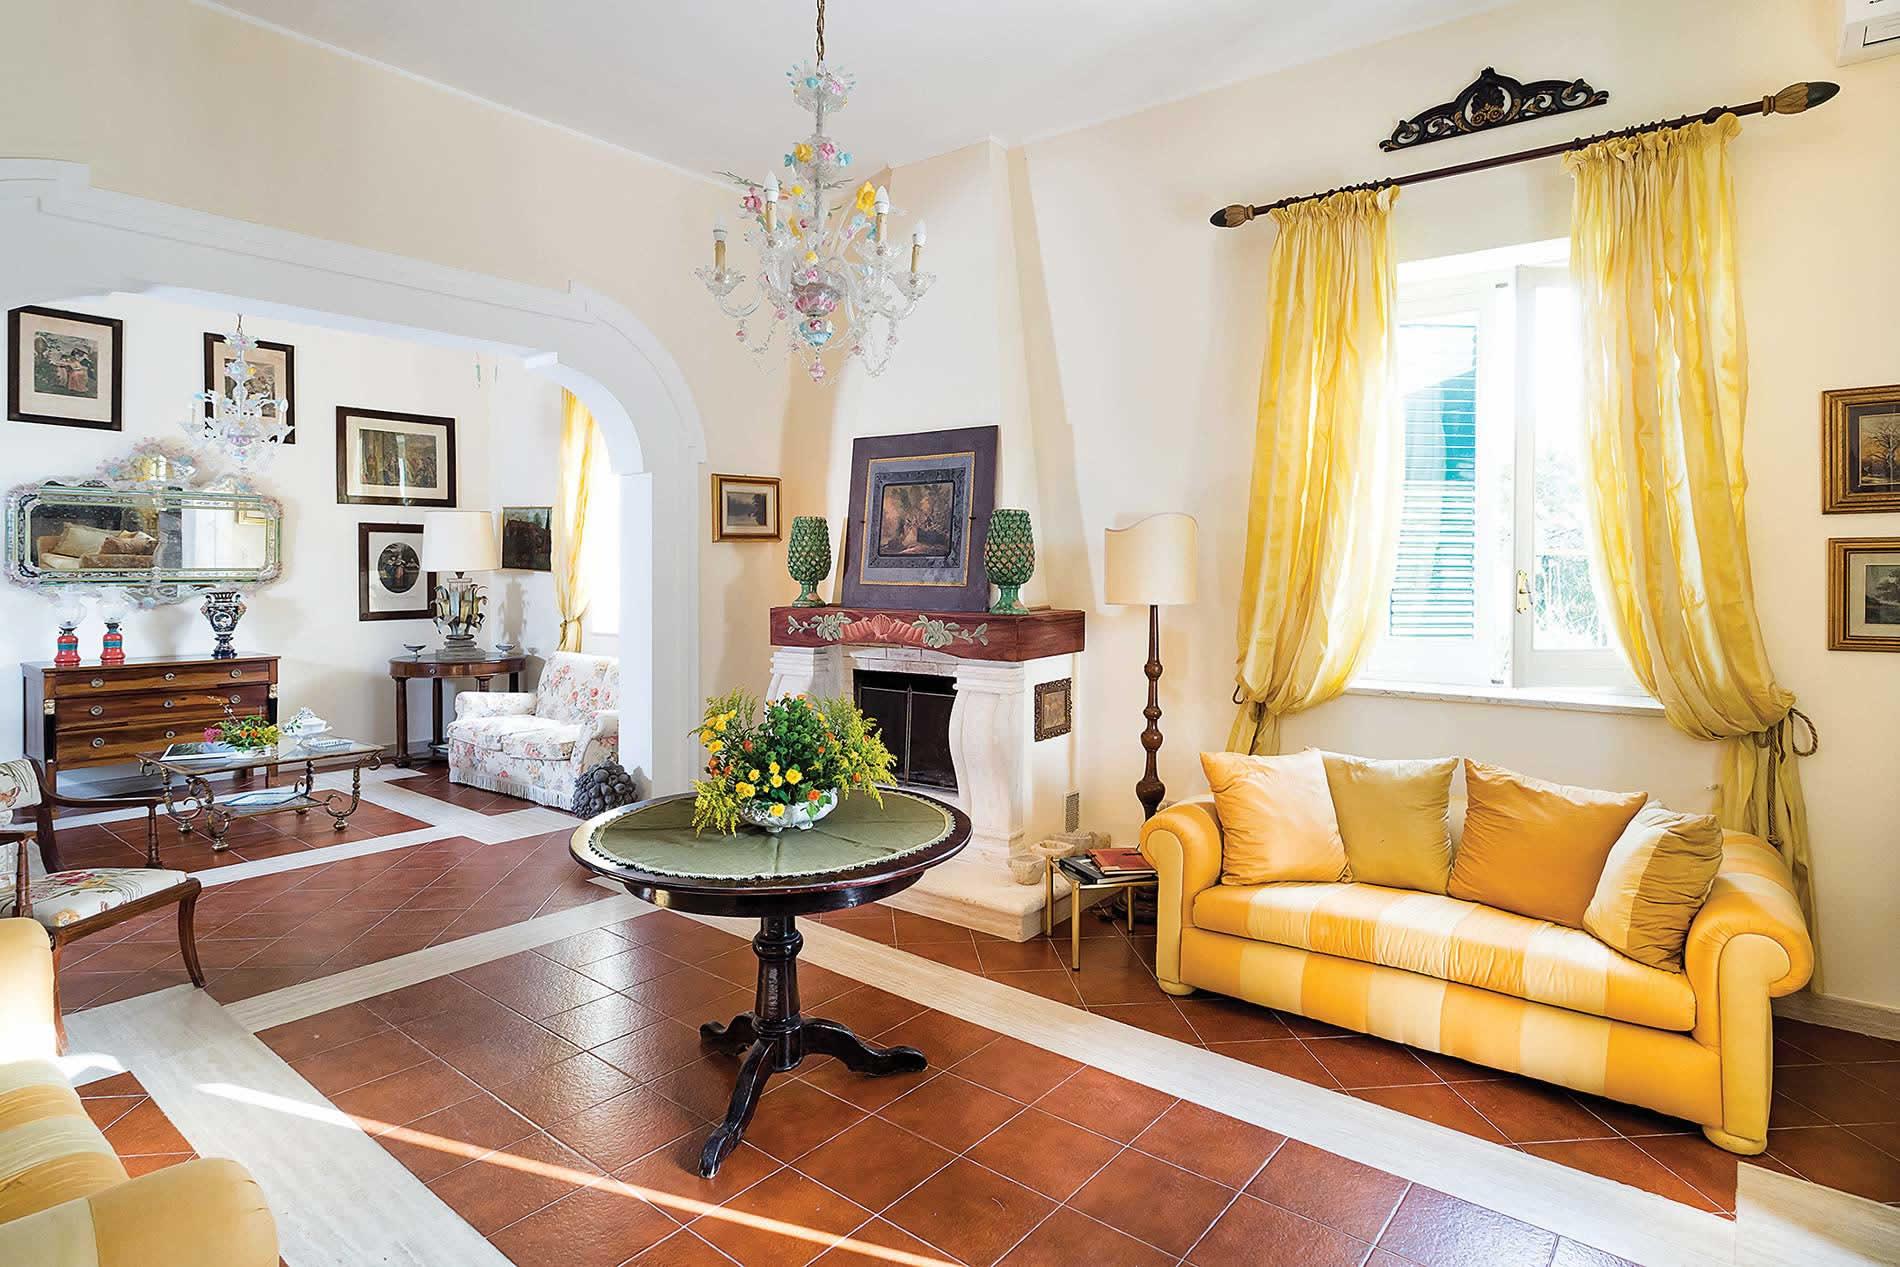 Villa San Ciro in Trapani - sleeps 10 people